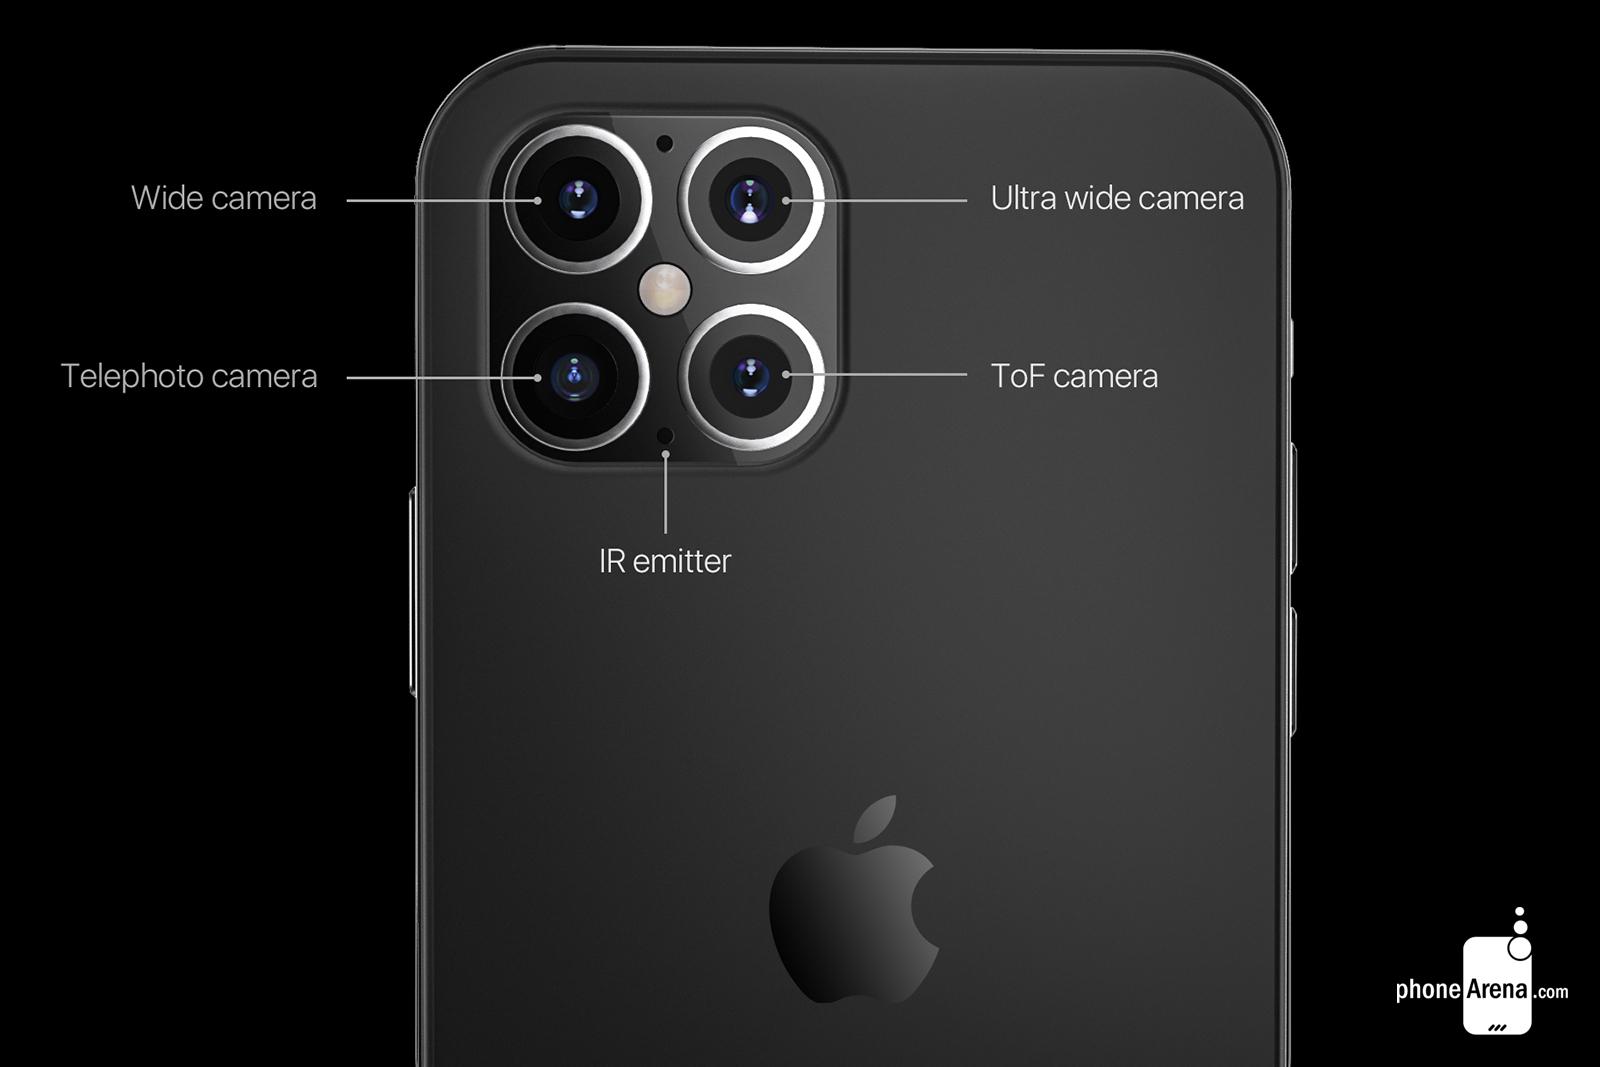 Як виглядатиме iPhone 12